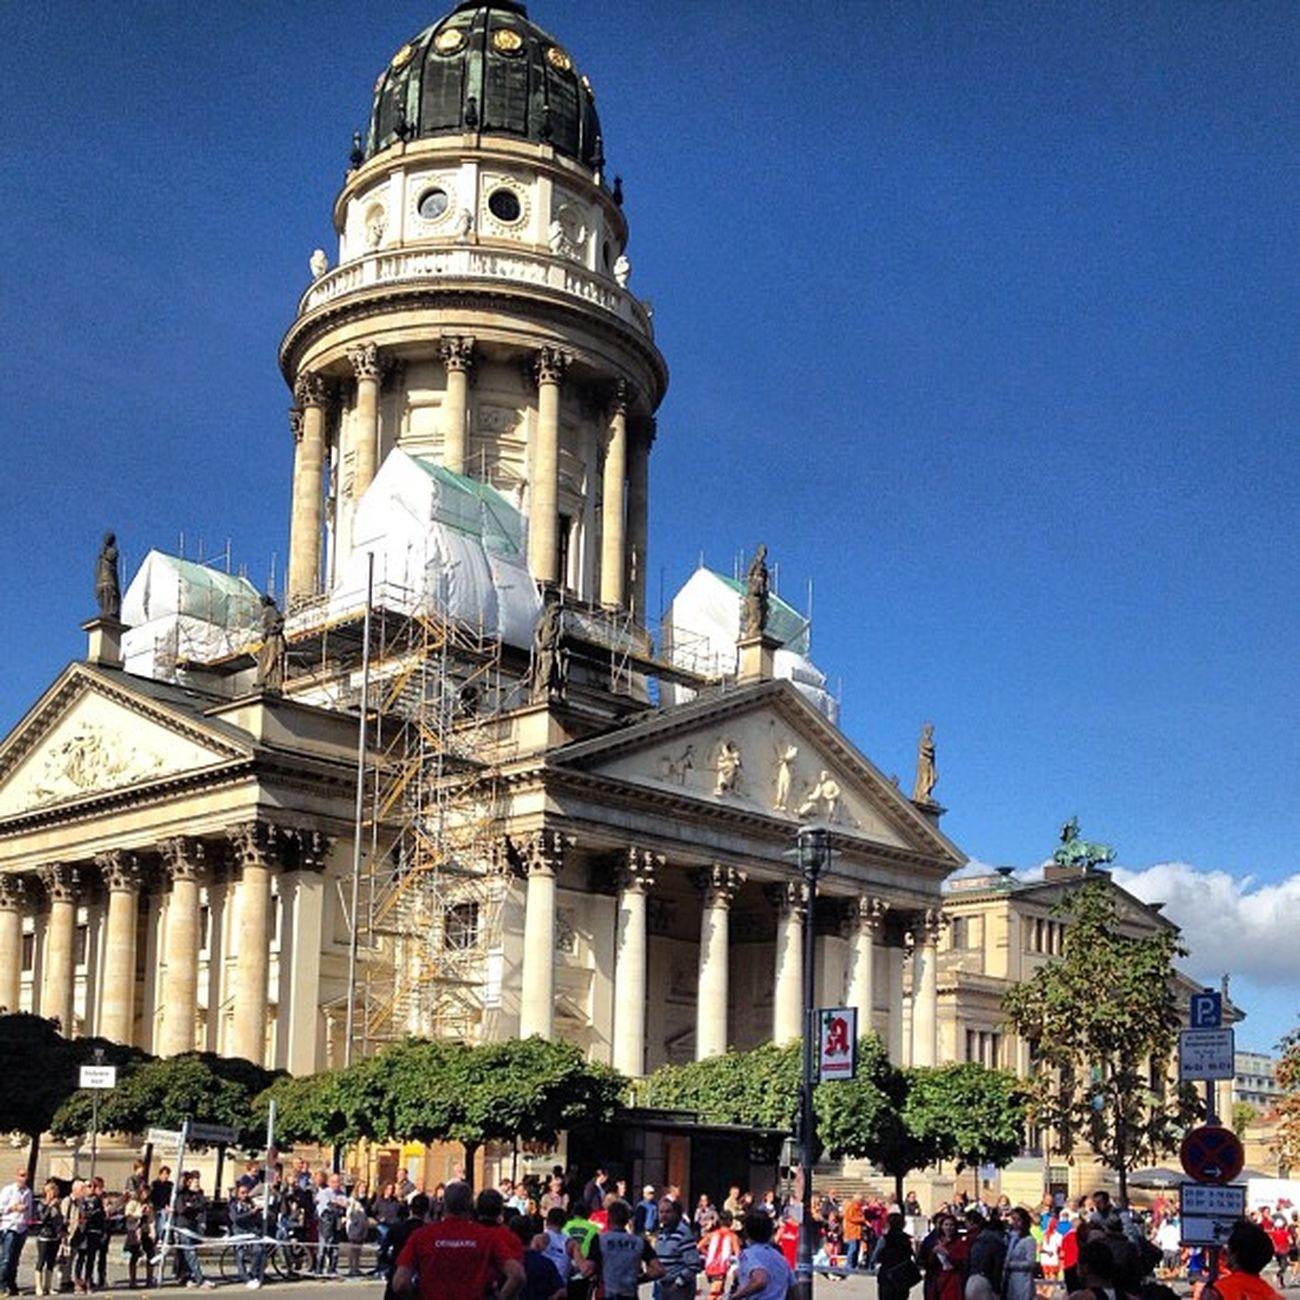 #architecture #Berlin #igersberlin #instagood #tweegram #photooftheday #follow #instamod #igers #picoftheday #instragamhub #instadaily #insta_germany #bestoftheday #igdaily #webstagram #instragramers #ig_special #igersberlin #gf_germany #all_shots #gendar Igers IGDaily Tweegram Instagood Webstagram Instadaily Igersberlin Insta_germany Architecture Gendarmenmarkt Berlin Gf_germany Dom Instragramers Photooftheday Ig_special Picoftheday Instragamhub Follow Instamod All_shots Bestoftheday